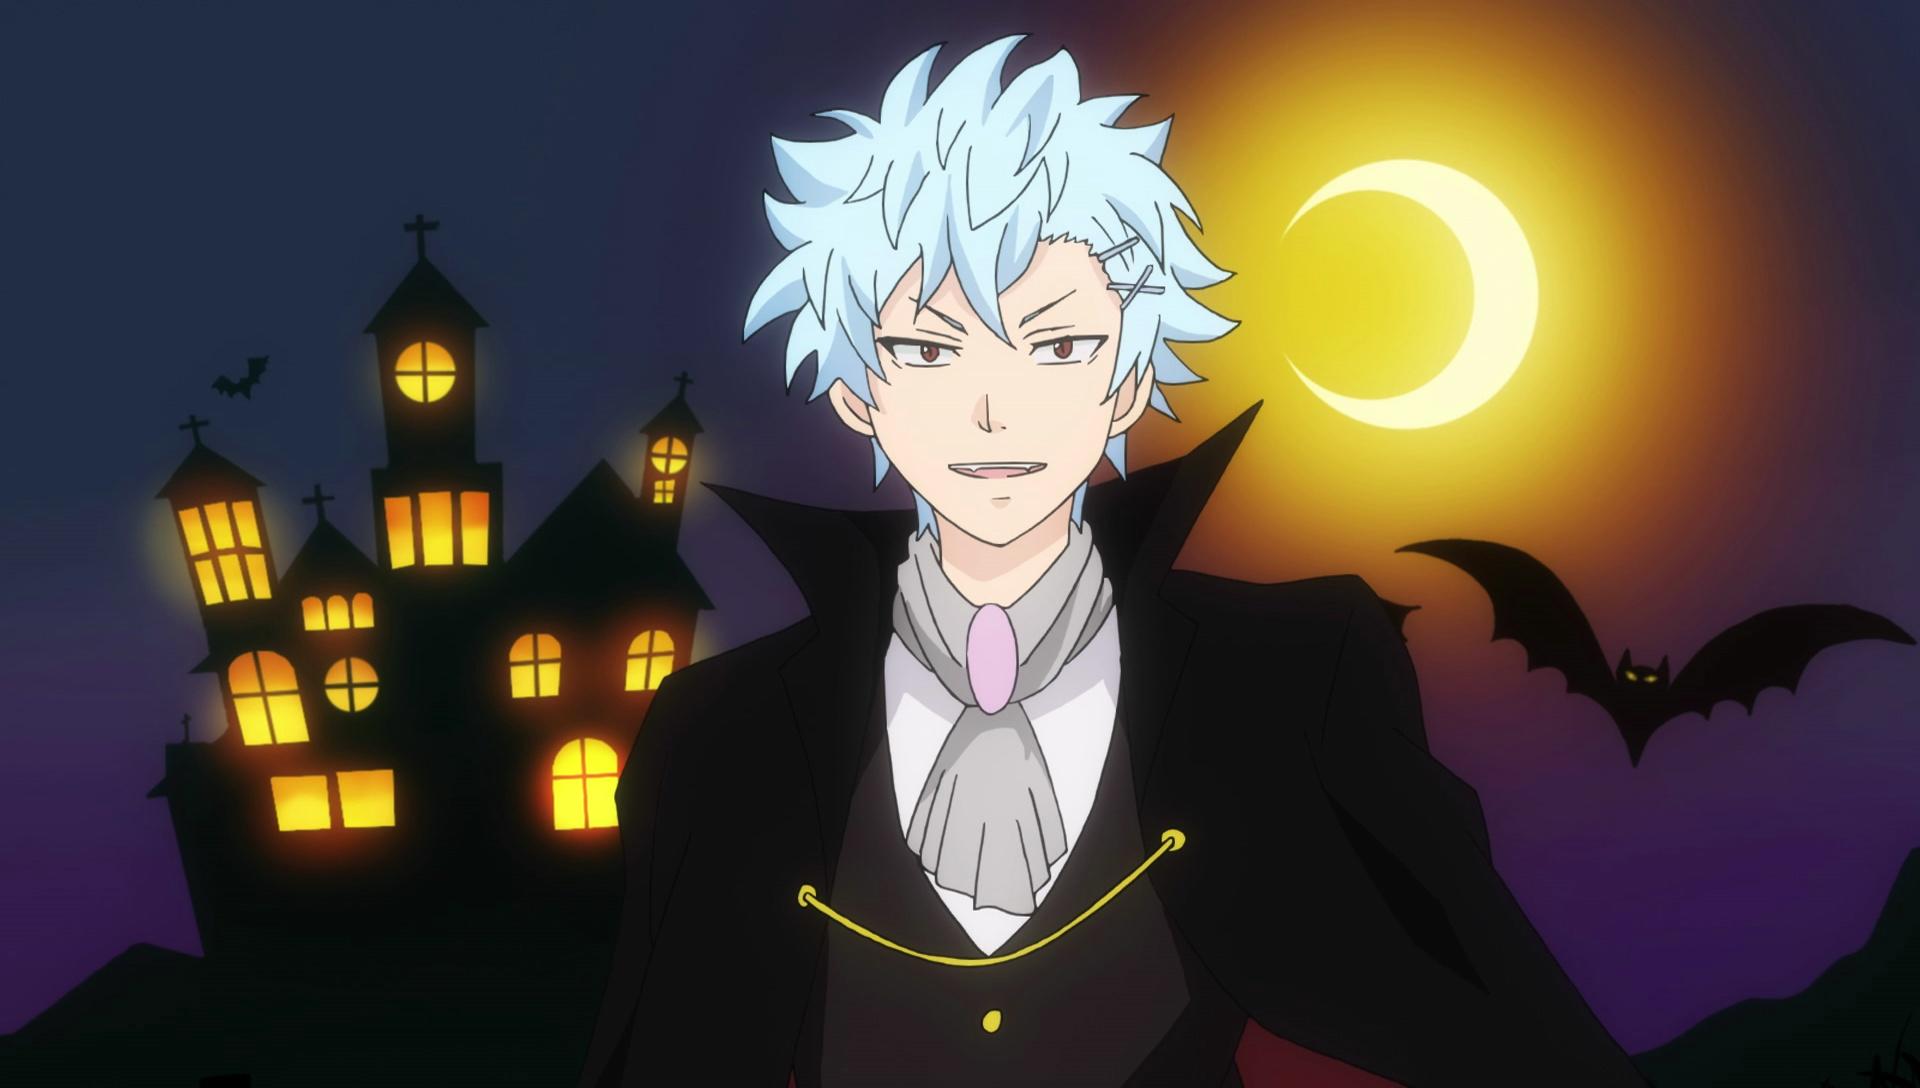 Watch the disastrous life of saiki k season 1 episode 23 sub dub anime simulcast funimation - The disastrous life of saiki k season 2 episode 1 ...